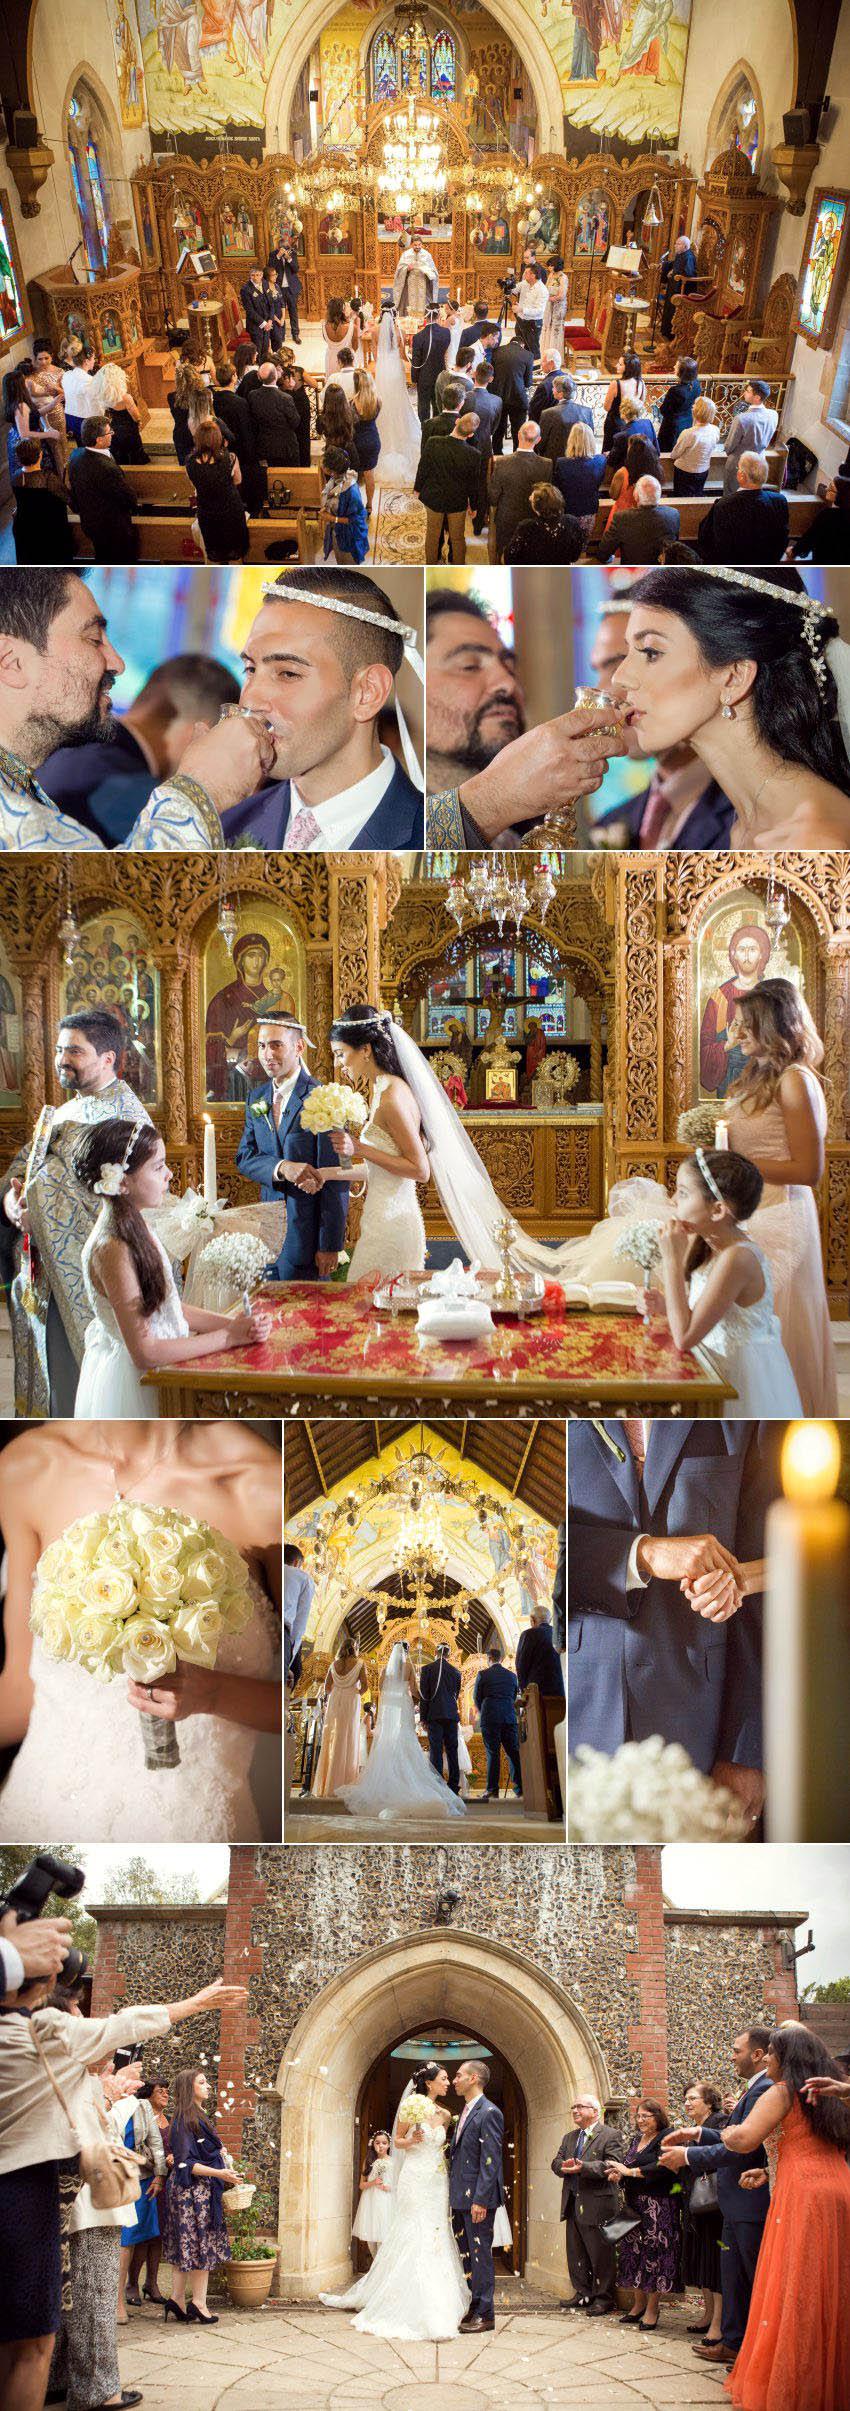 A wedding at 12 Apostles Greek church 11